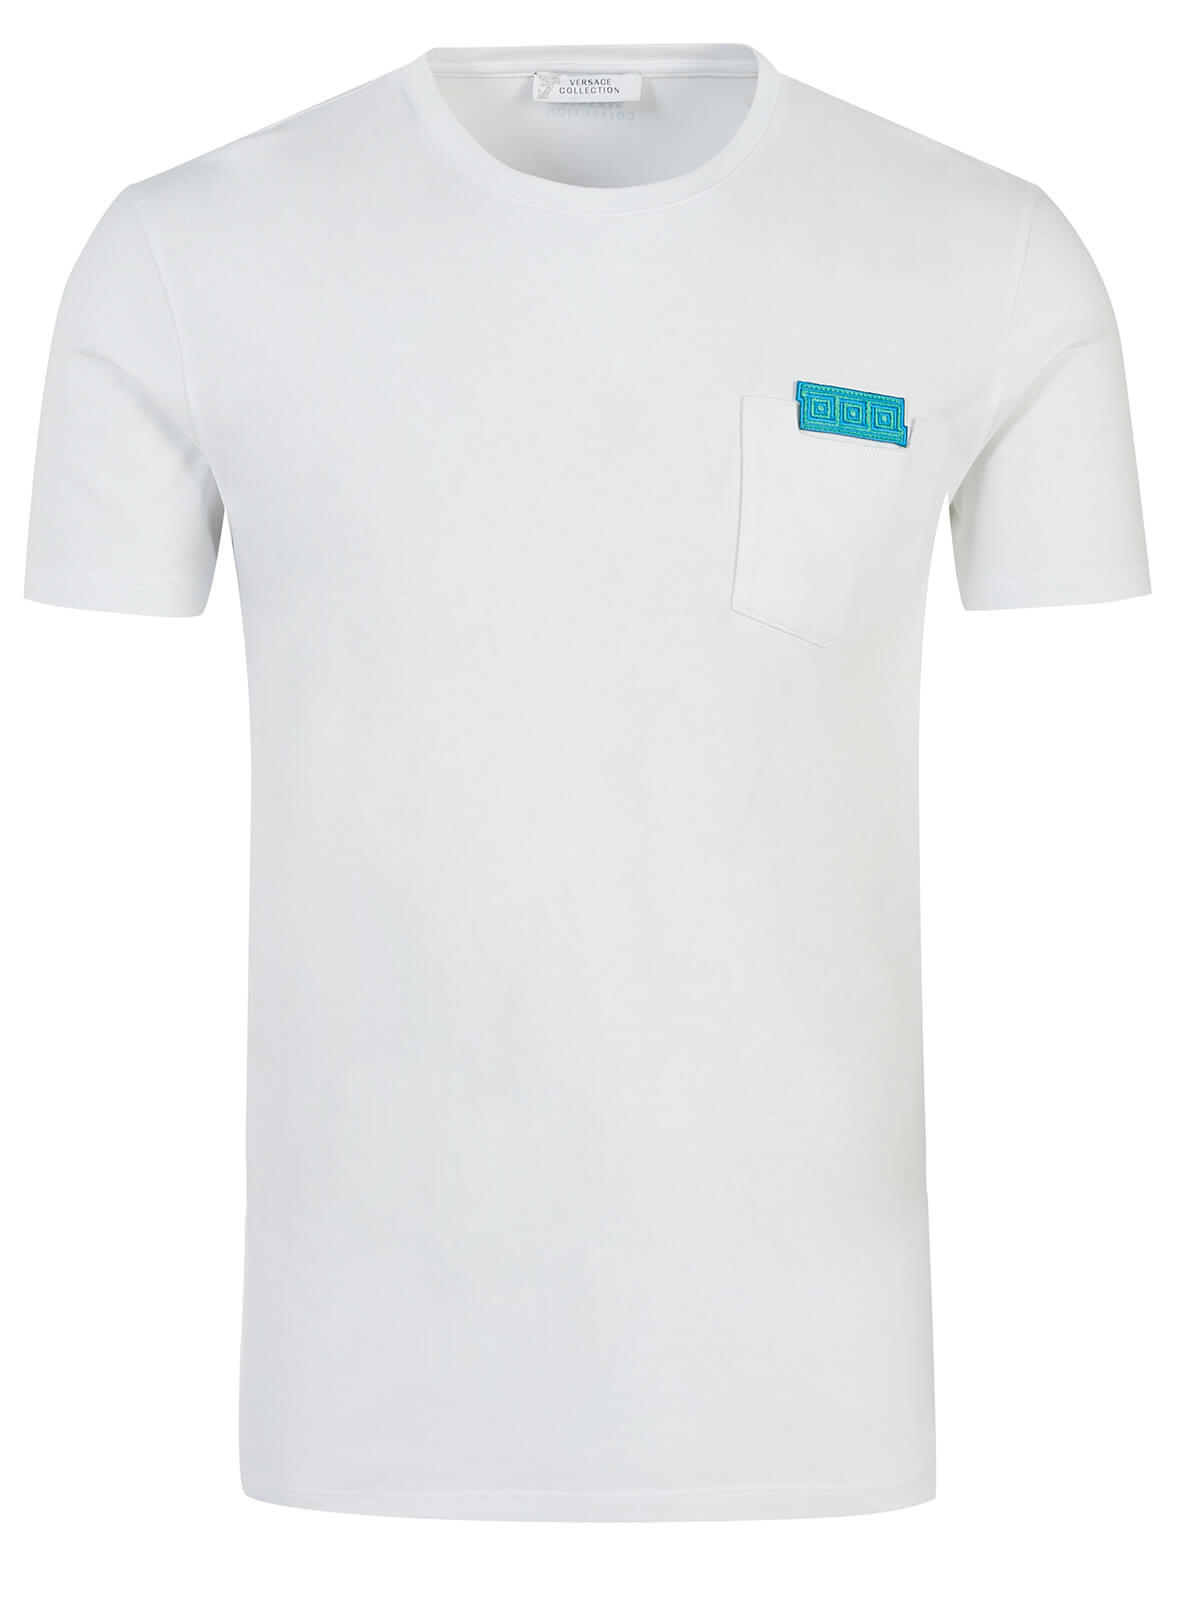 5b1af8f9 Versace Collection T-shirt white   Fashionesta online shop